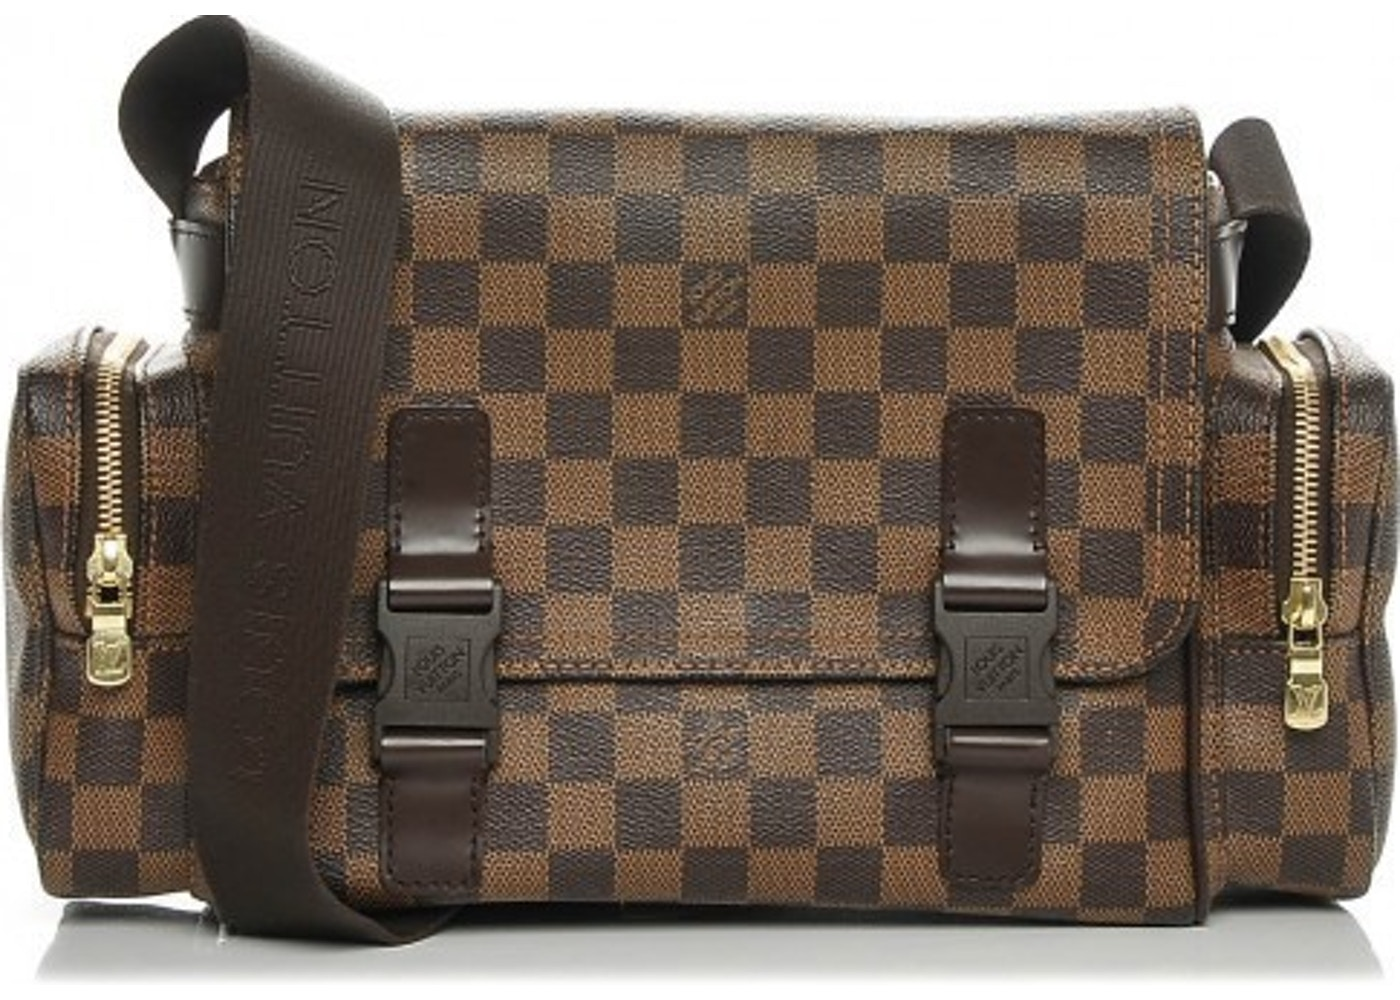 5df1485f2 Louis Vuitton Messenger Melville Reporter Damier Ebene Brown